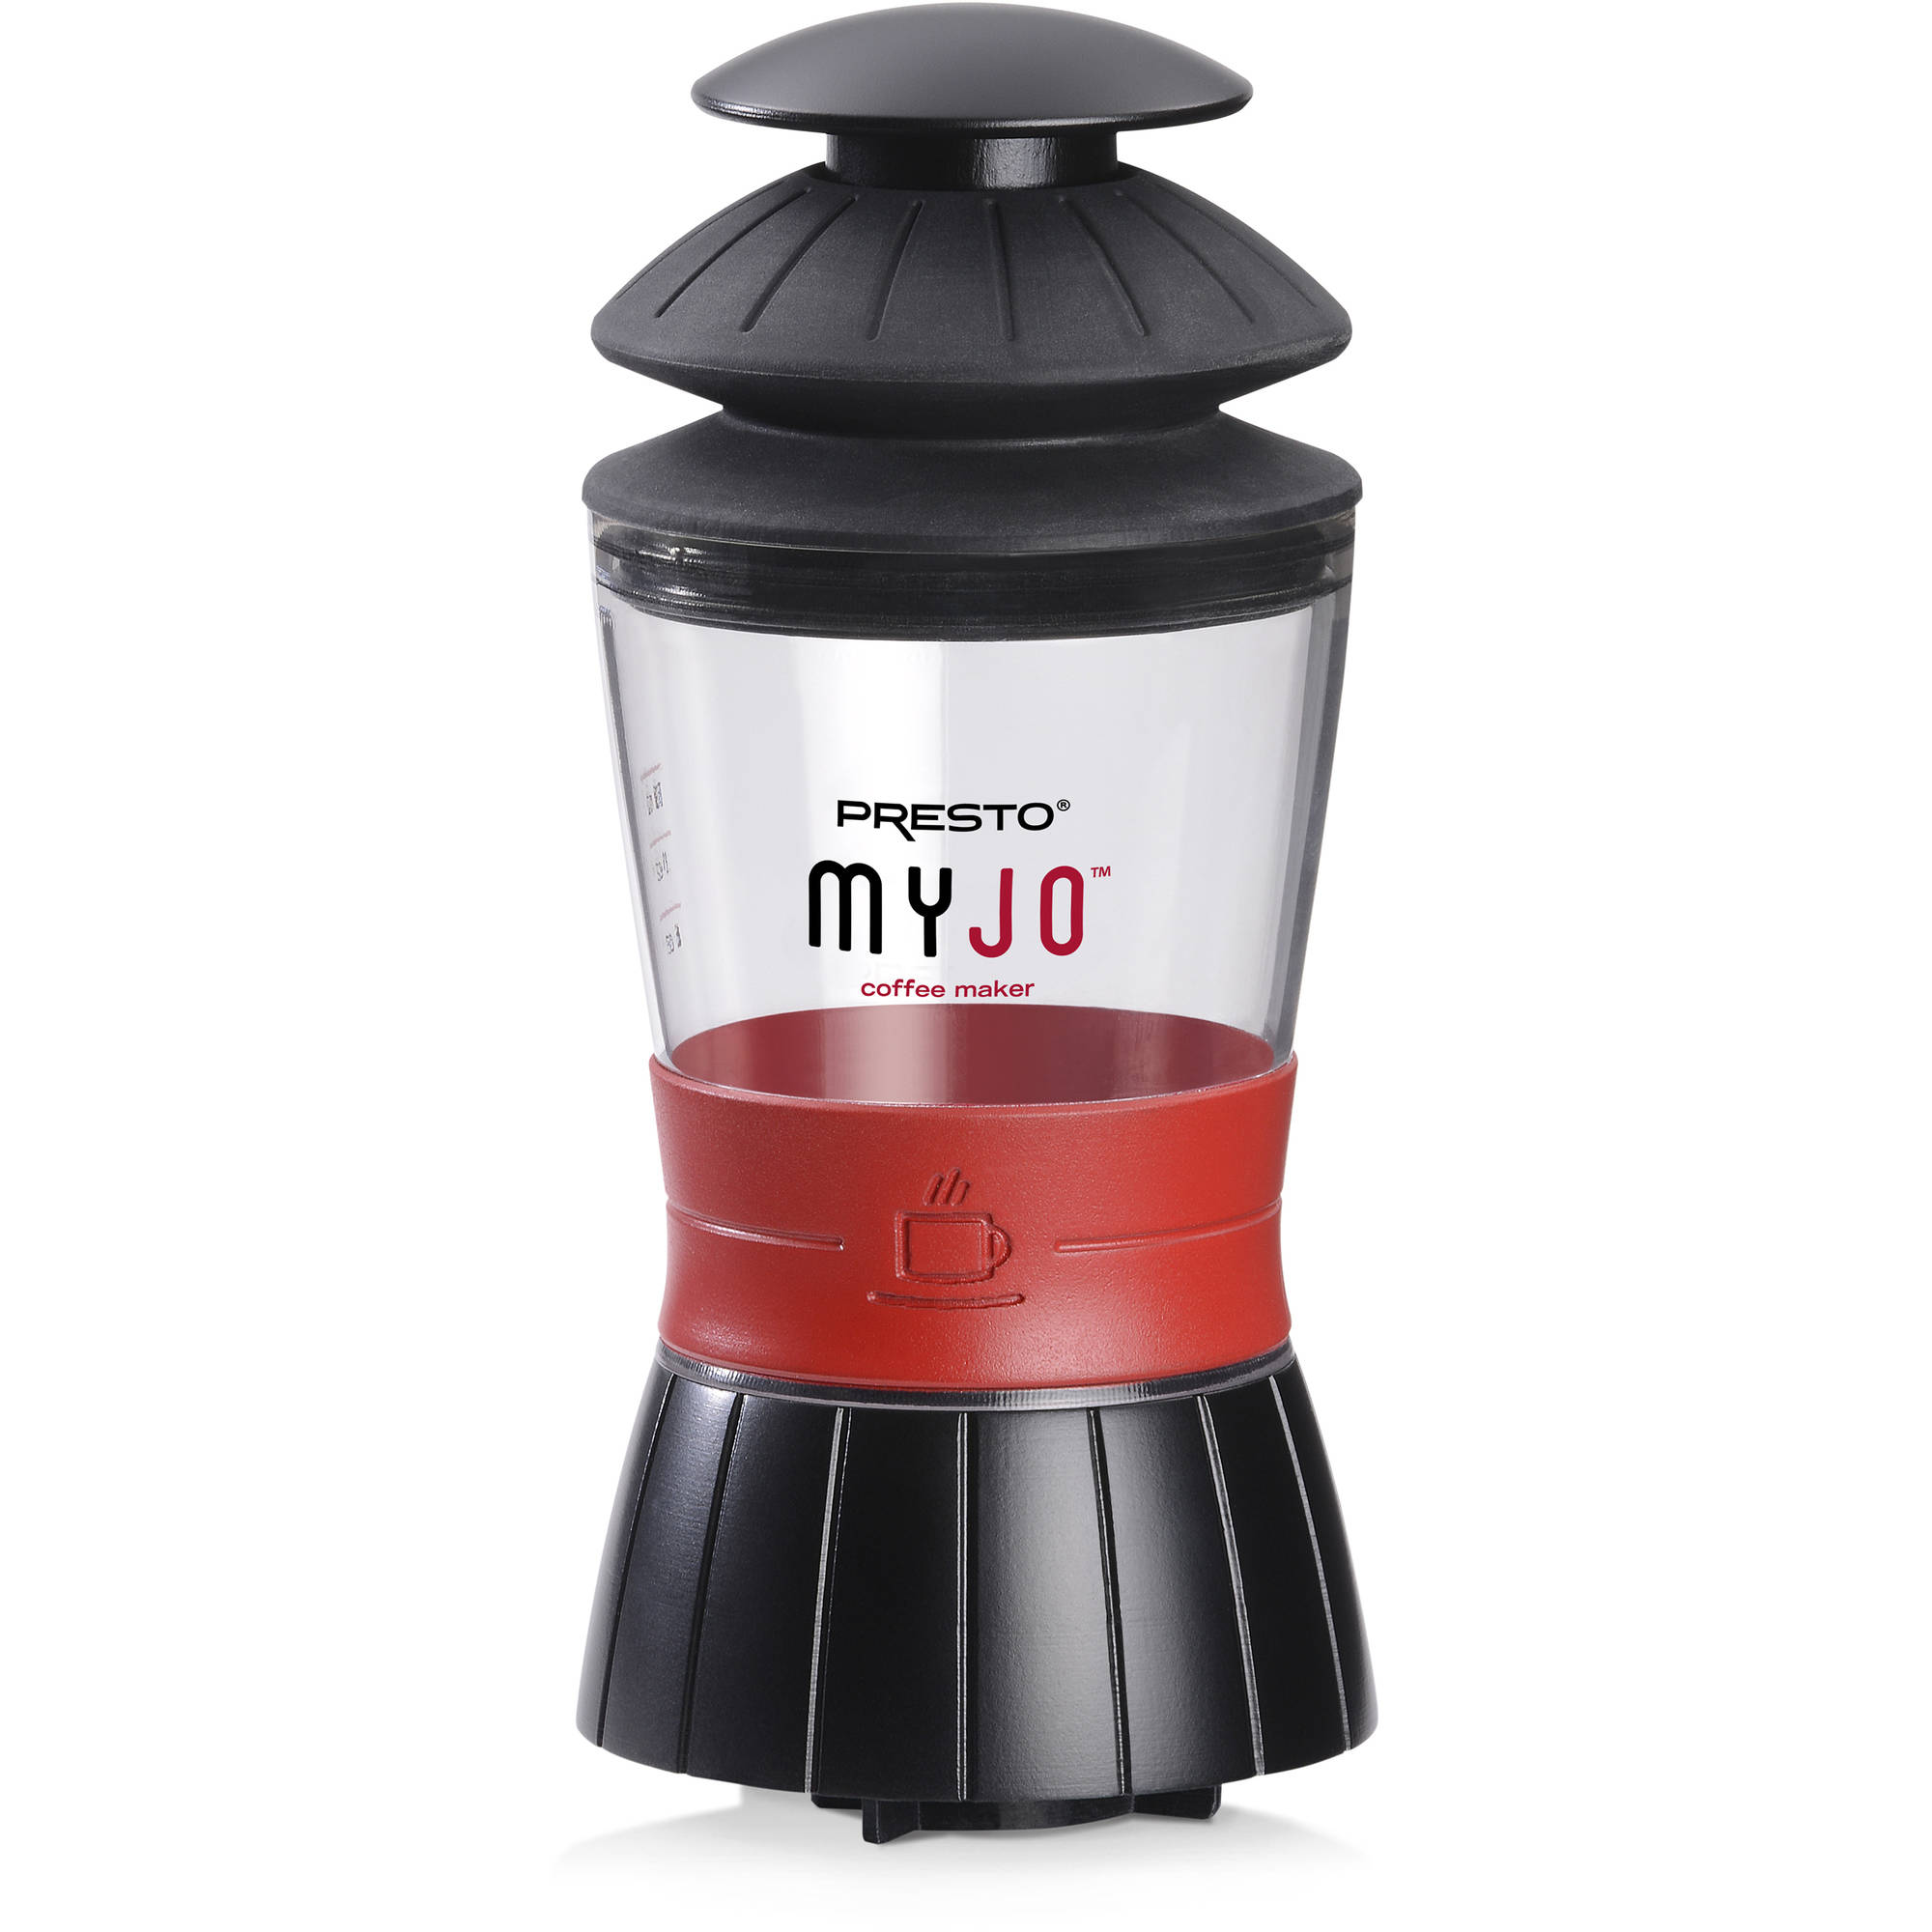 Keurig coffee makers at bed bath and beyond - Presto Myjo Single Cup Coffee Maker